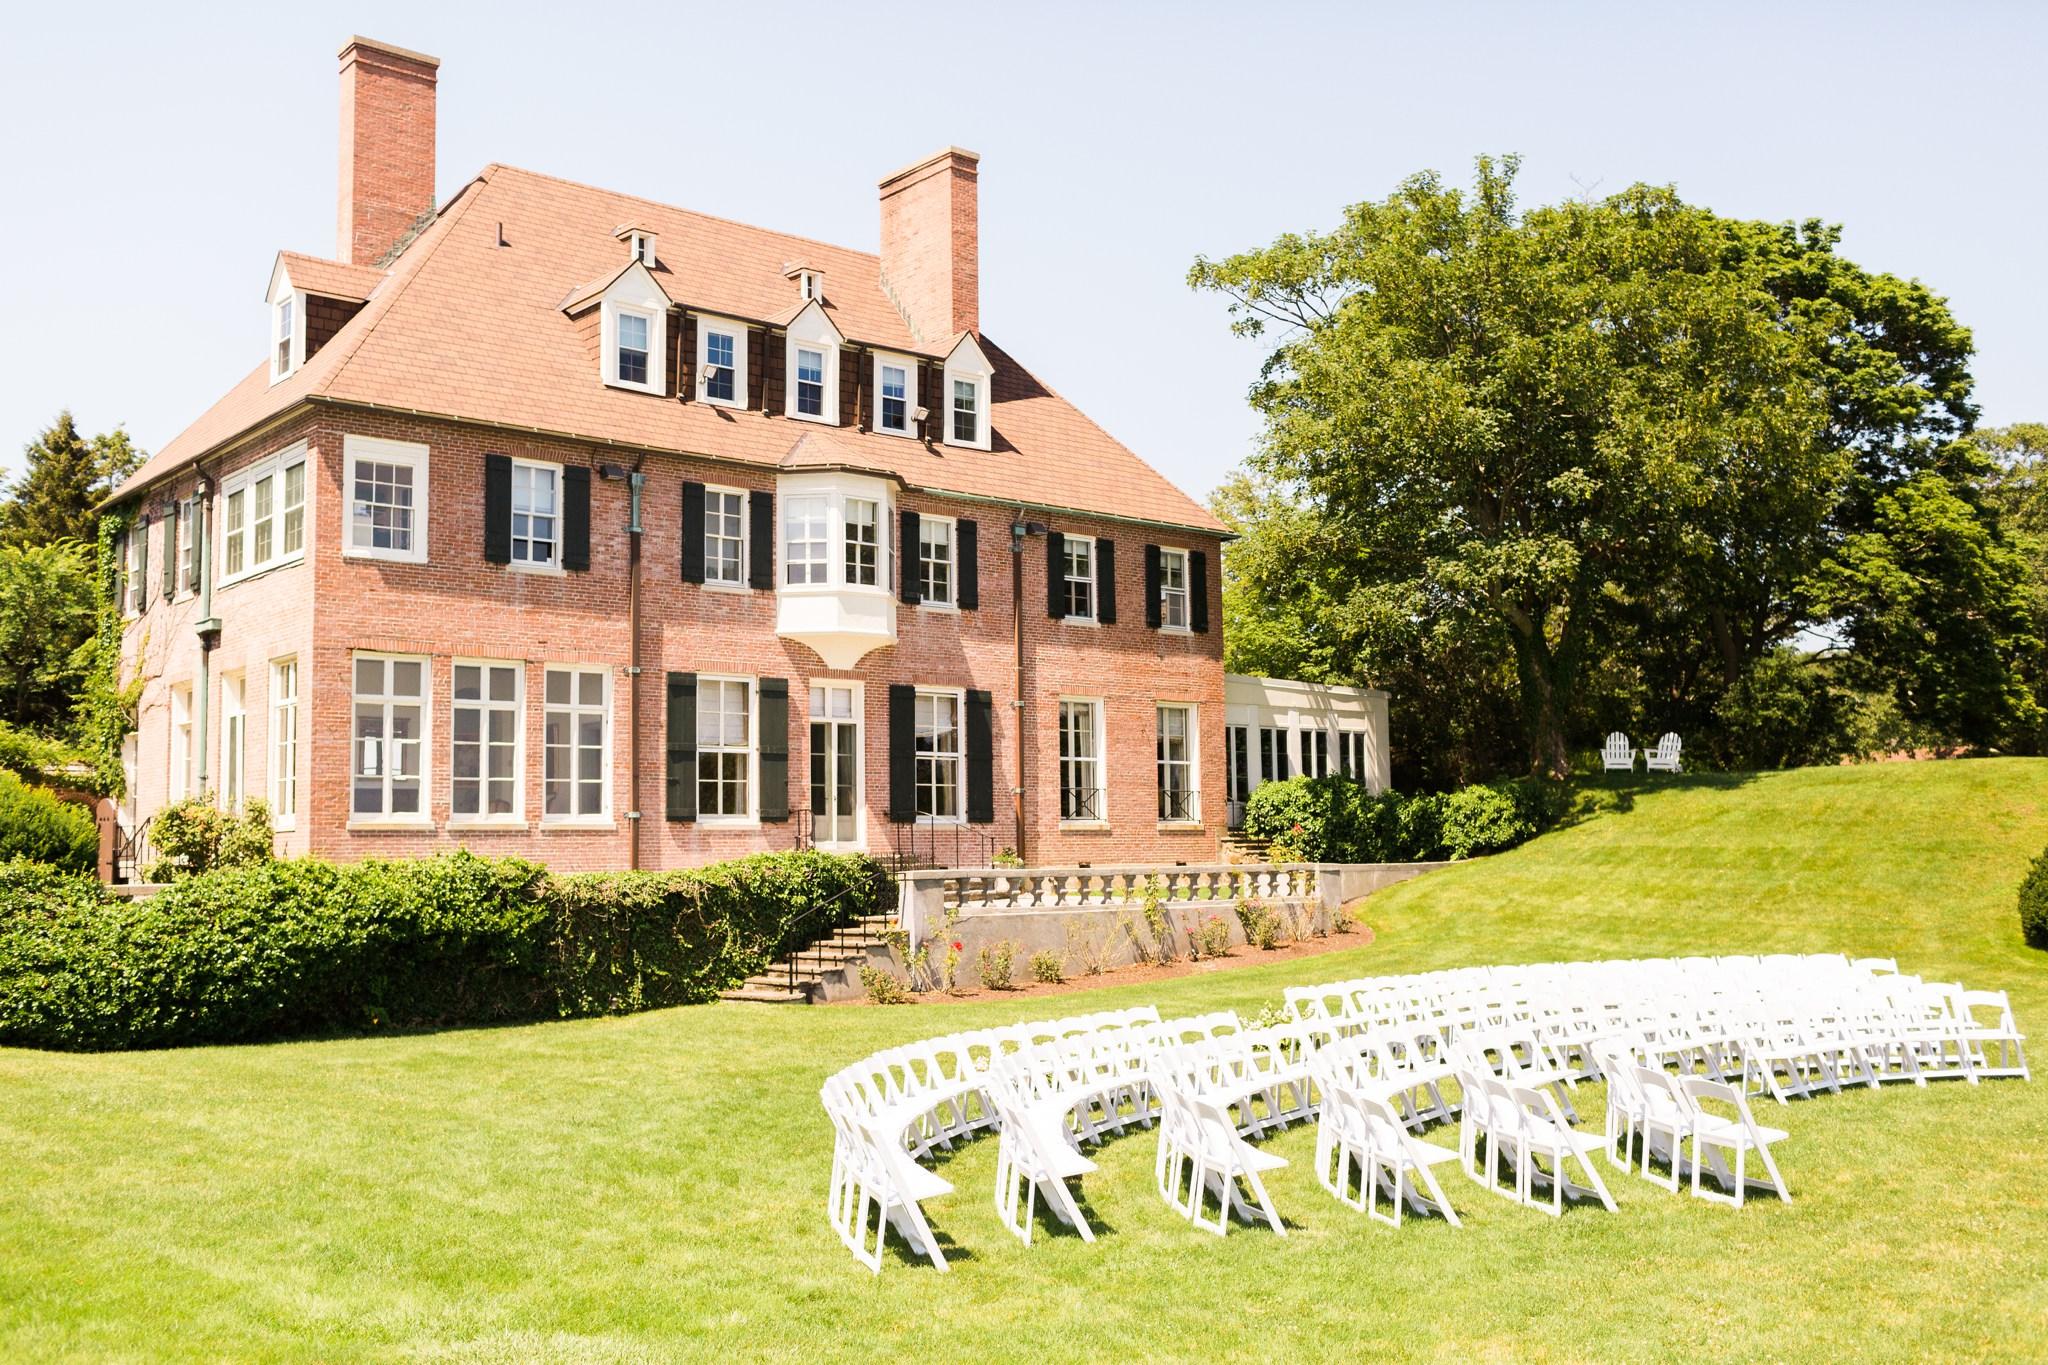 misselwood_endicott_college_wedding_photos_00040.JPG